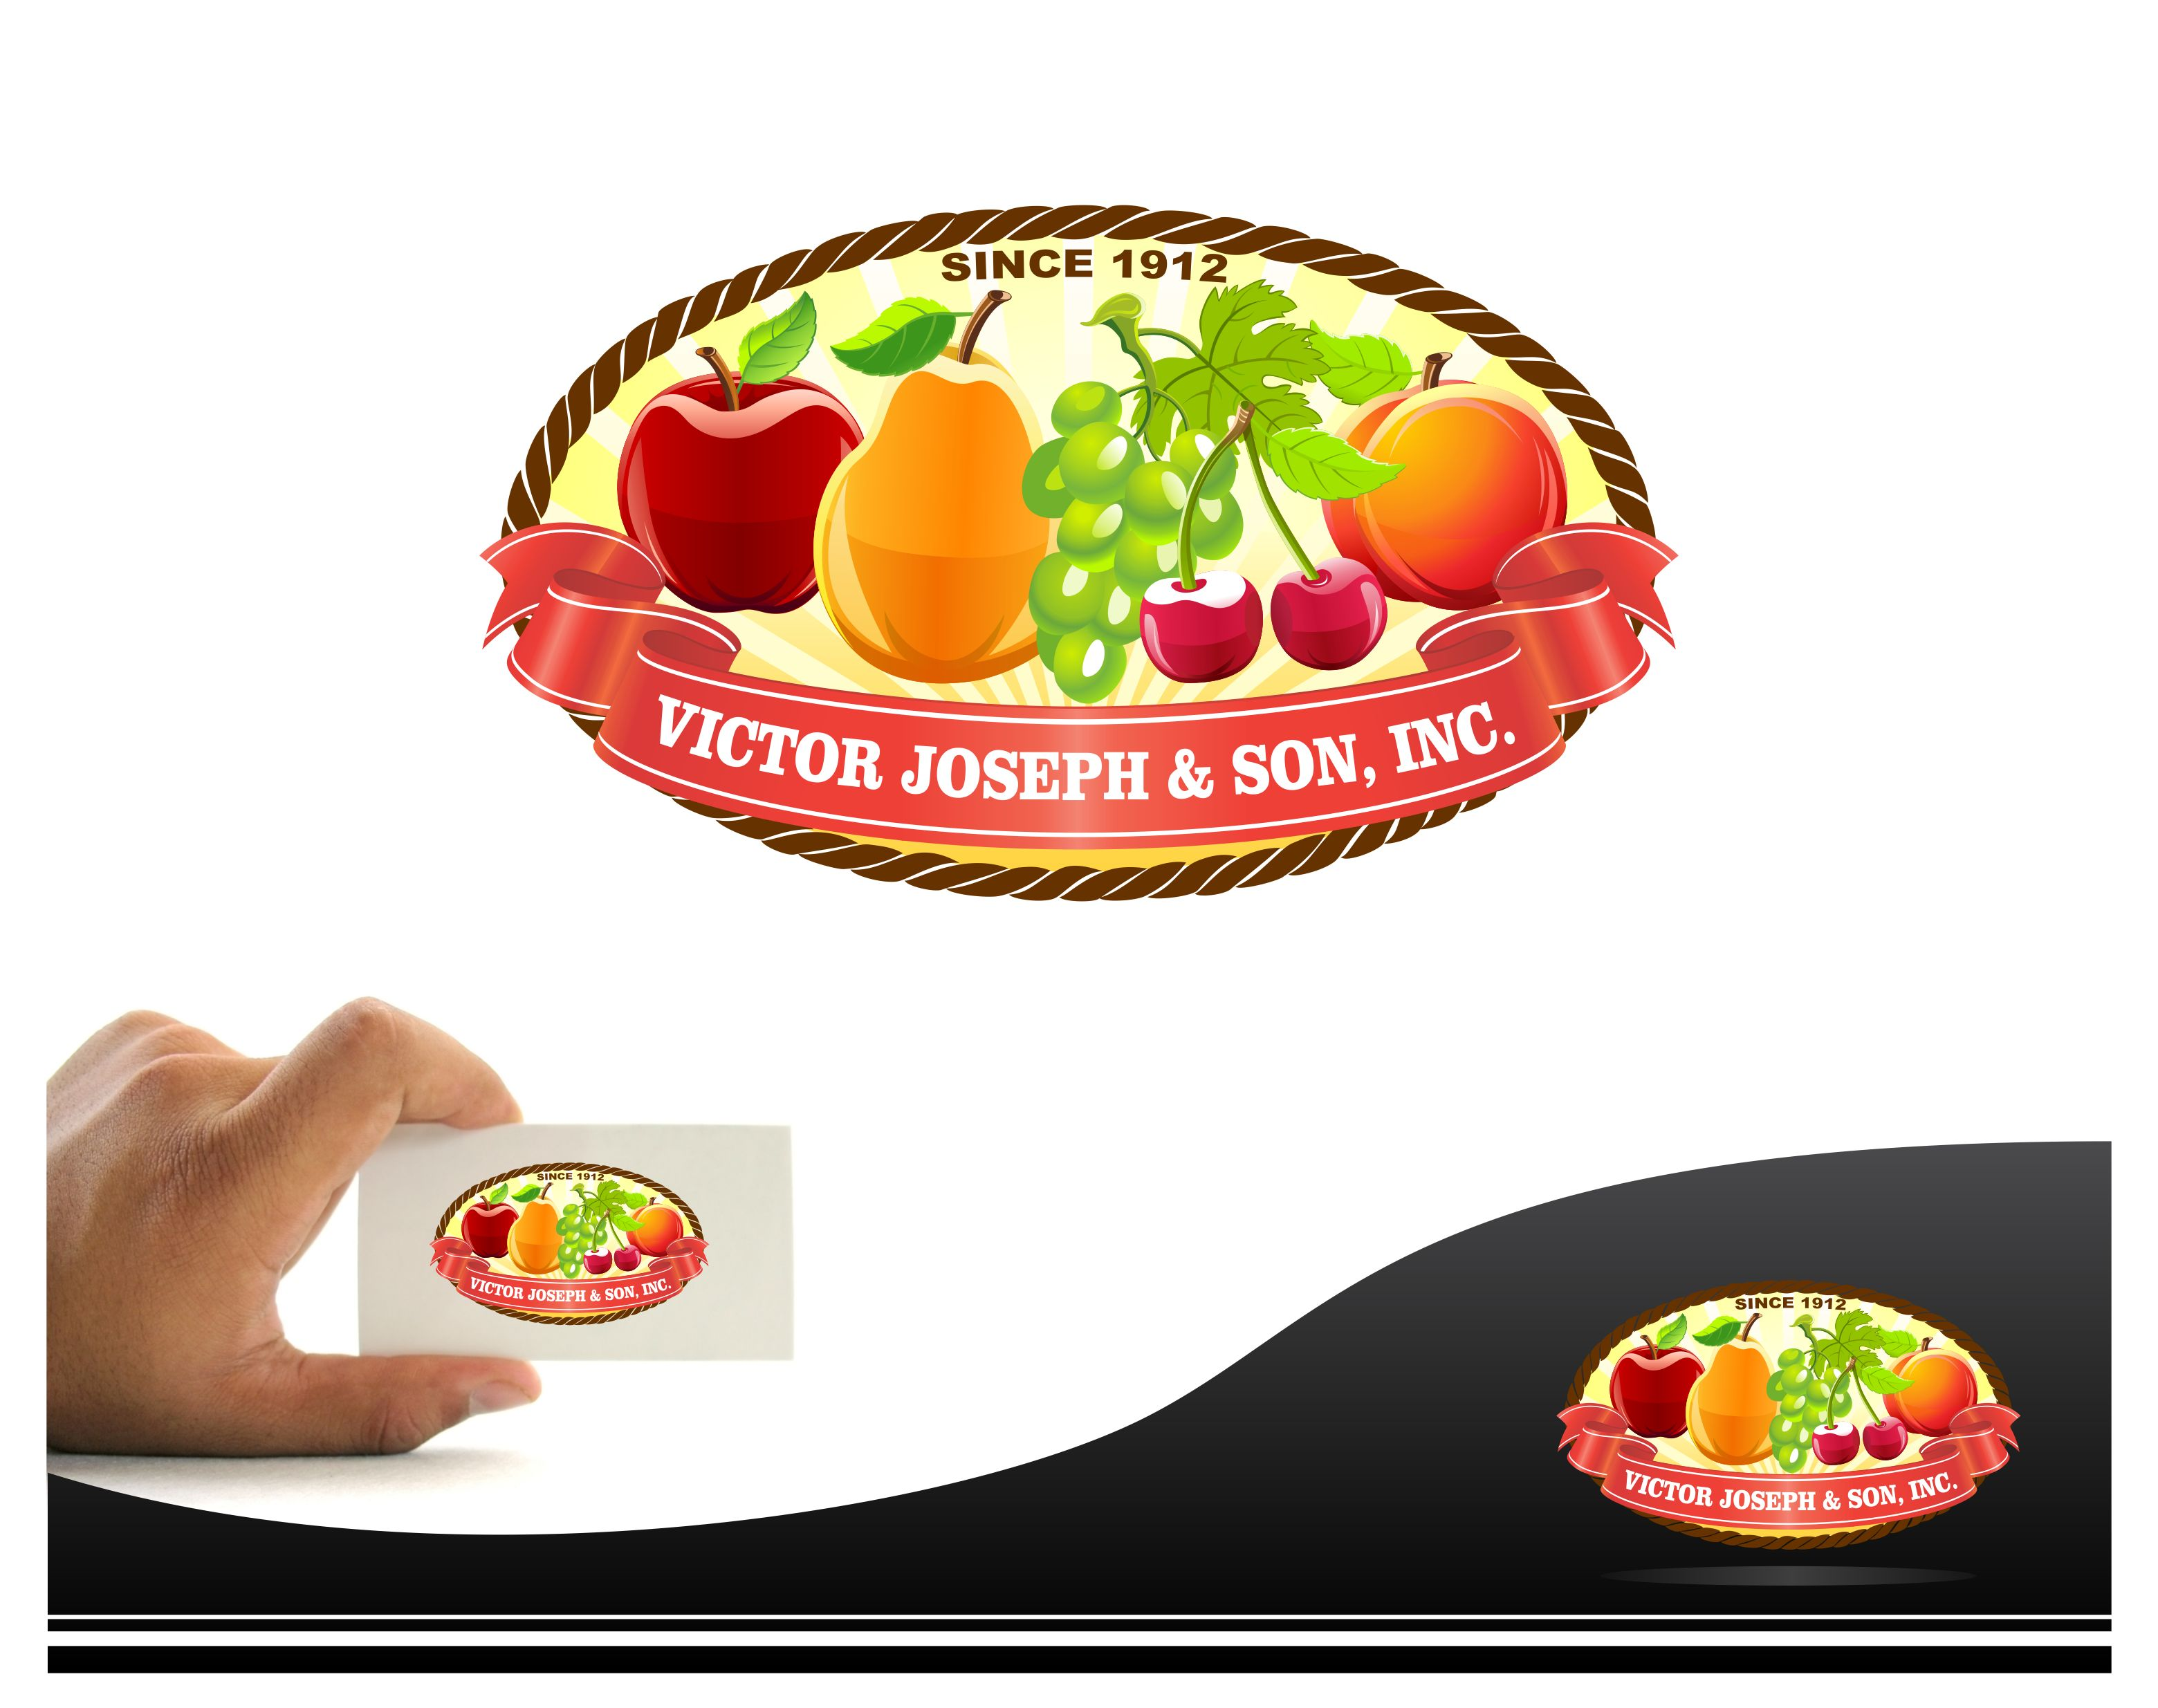 Logo Design by joca - Entry No. 178 in the Logo Design Contest Imaginative Logo Design for Victor Joseph & Son, Inc..